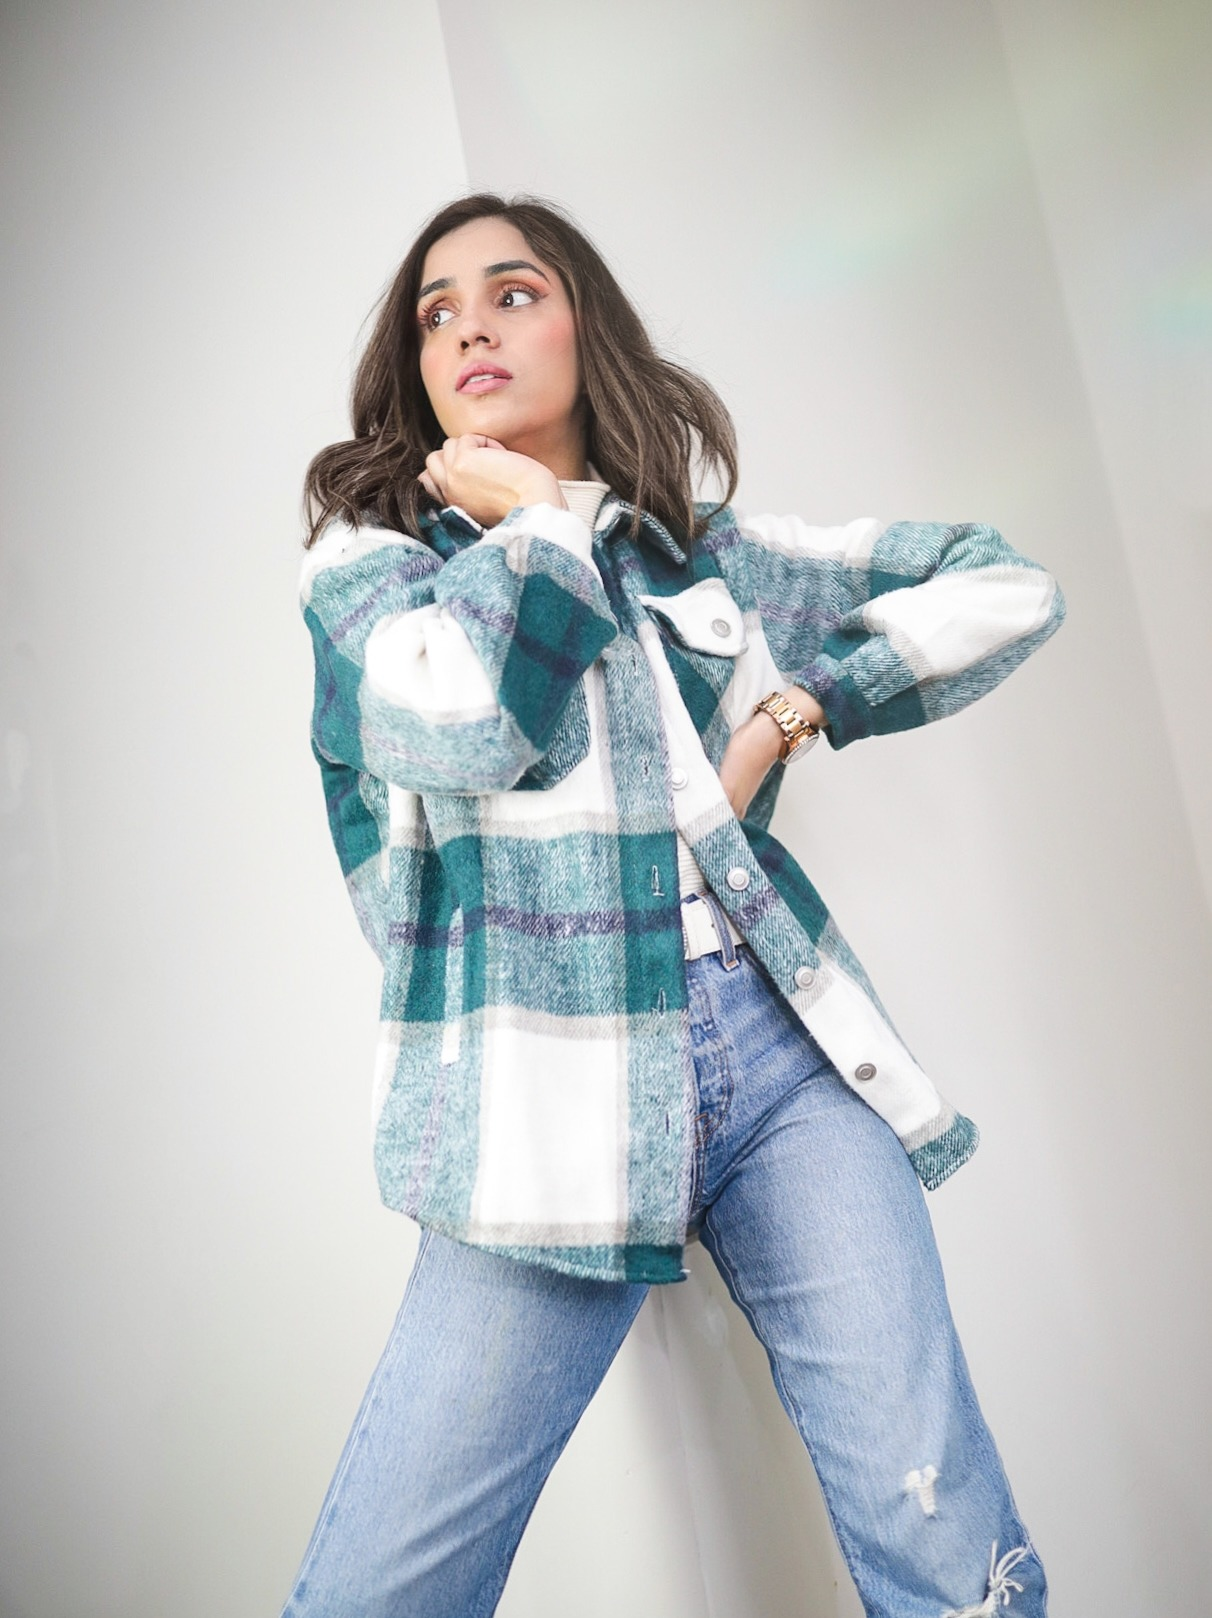 Tiktok Viral Products Everyone is Raving About Faiza Inam Amazon fashion 4